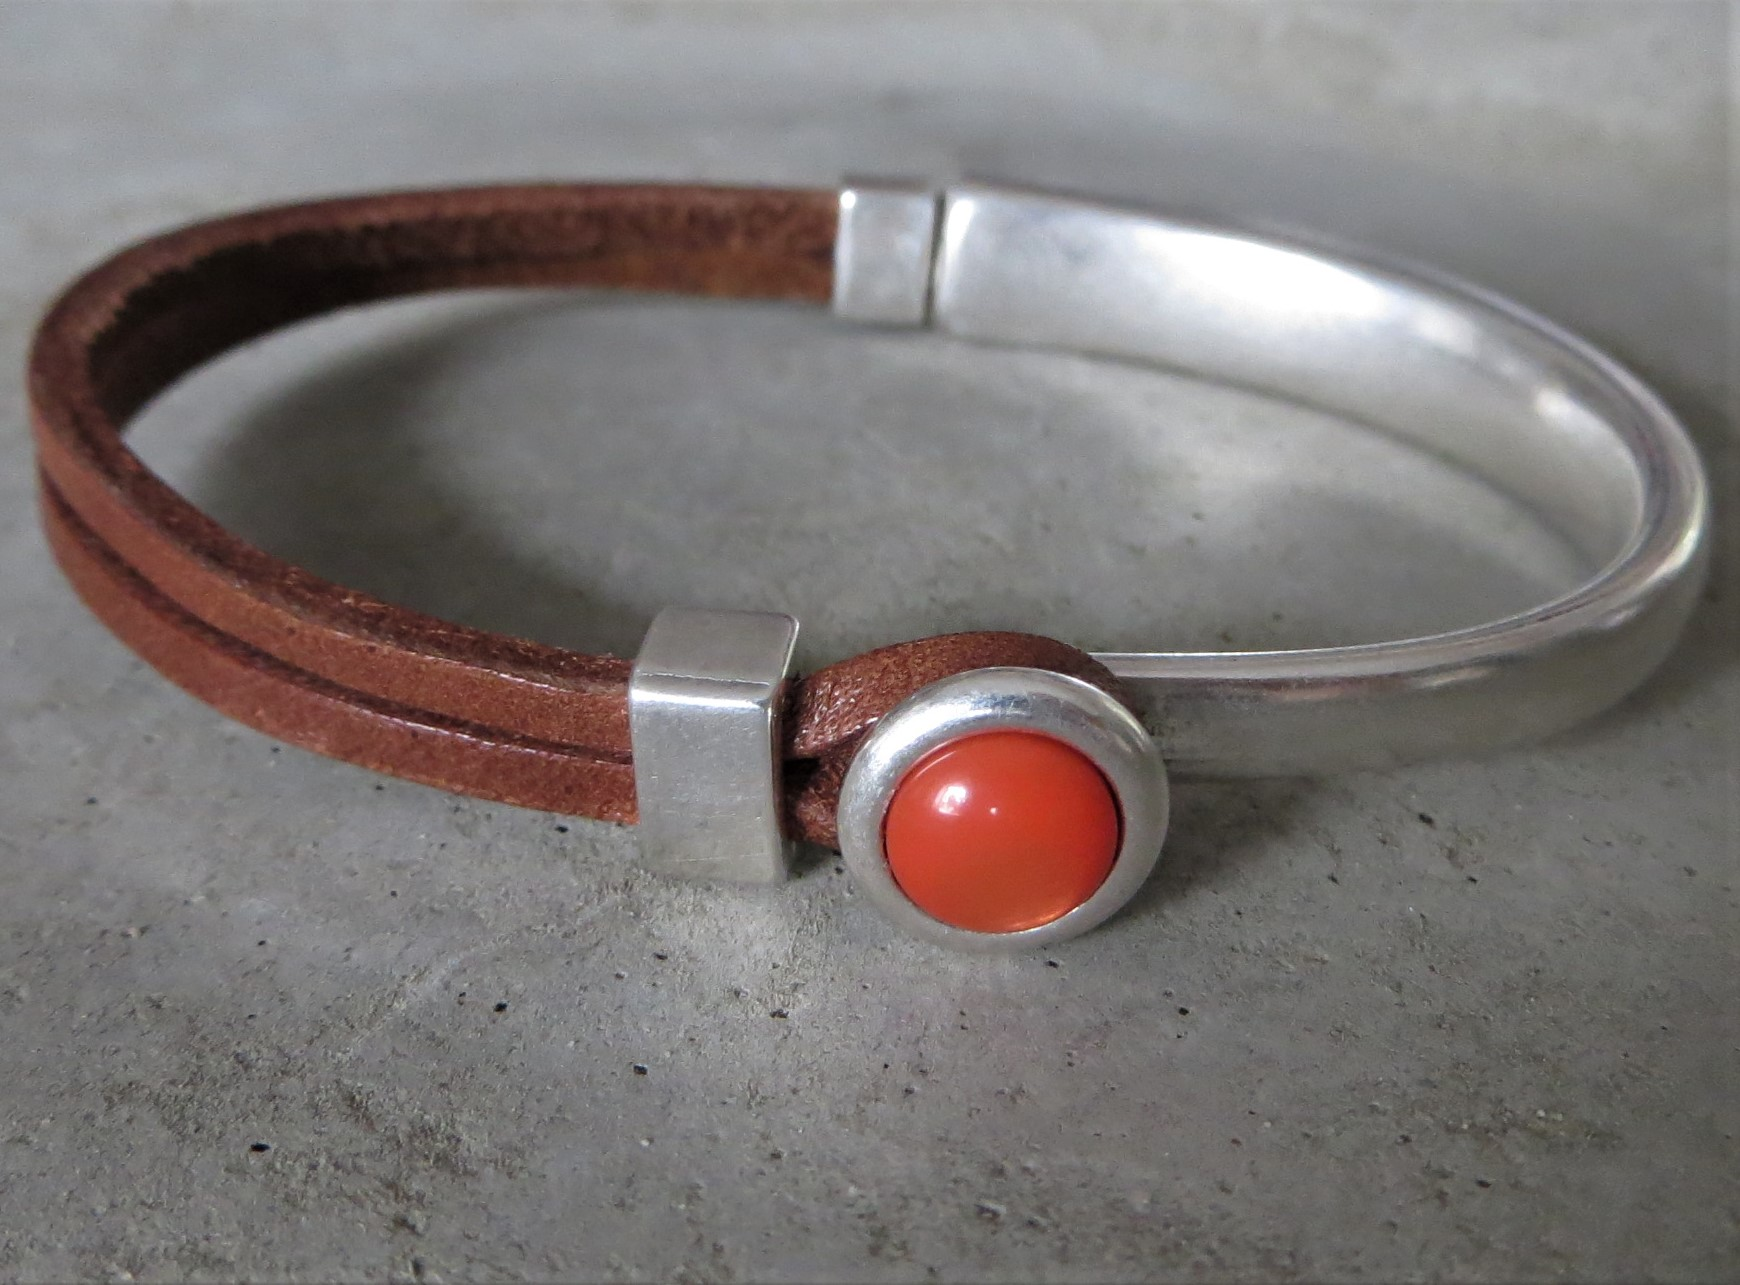 Armbaender - QOSS Armband EVA Braun Orange L  - Onlineshop Tante Emmer